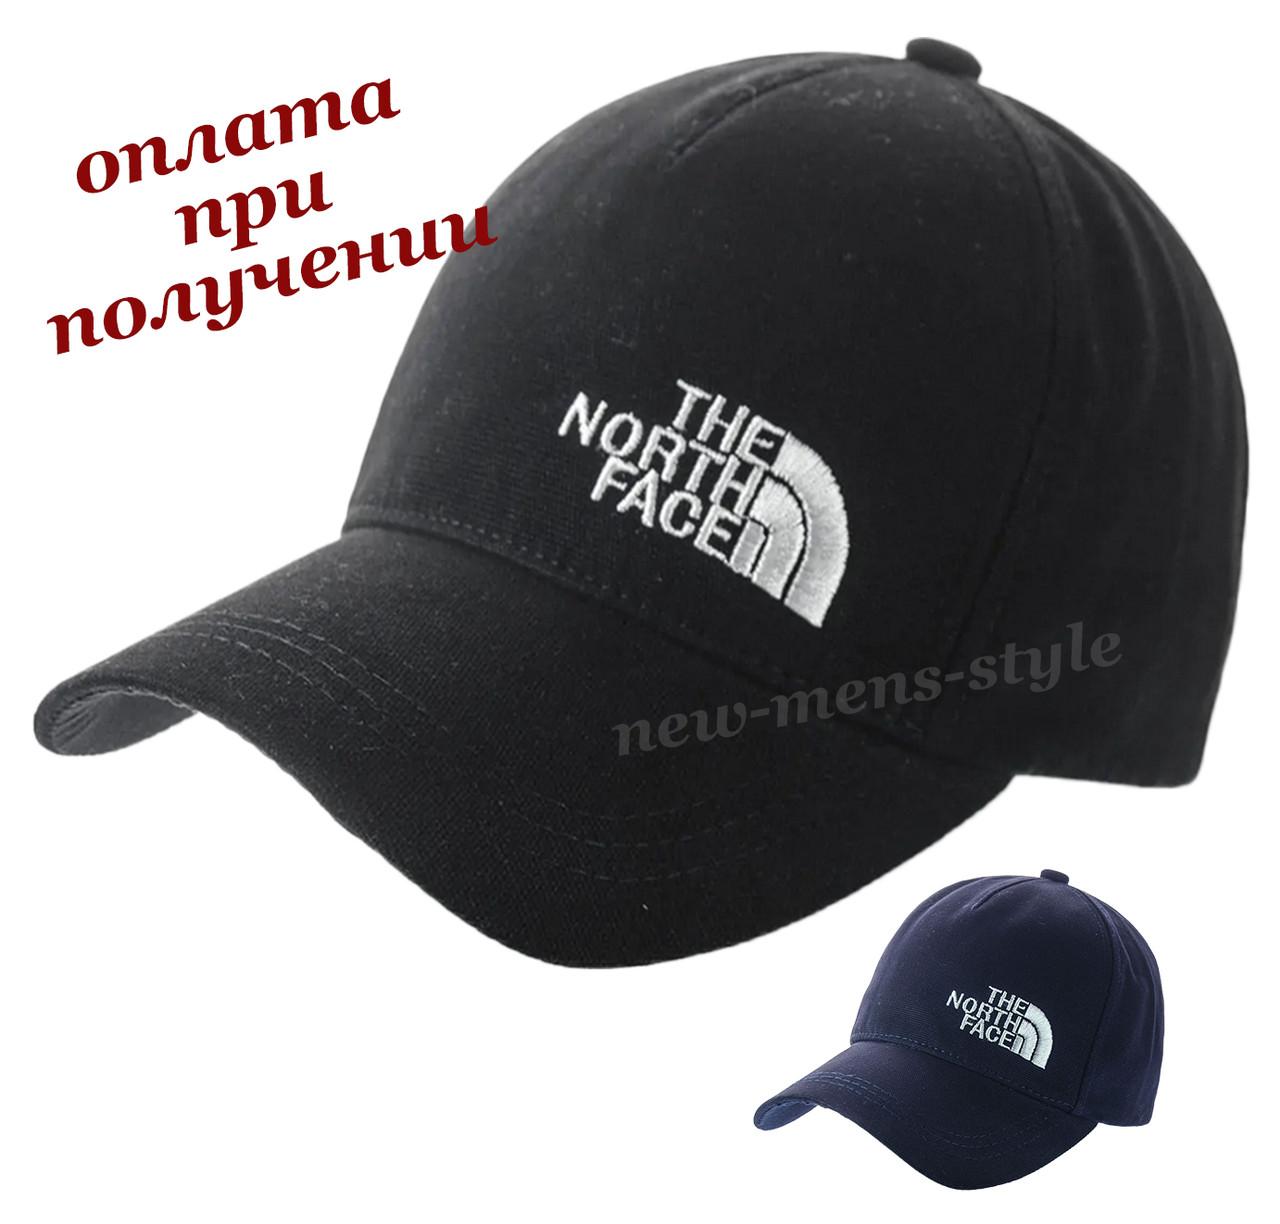 Чоловіча фірмова молодіжна модна стильна спортивна кепка бейсболка блайзер The North Face (2)